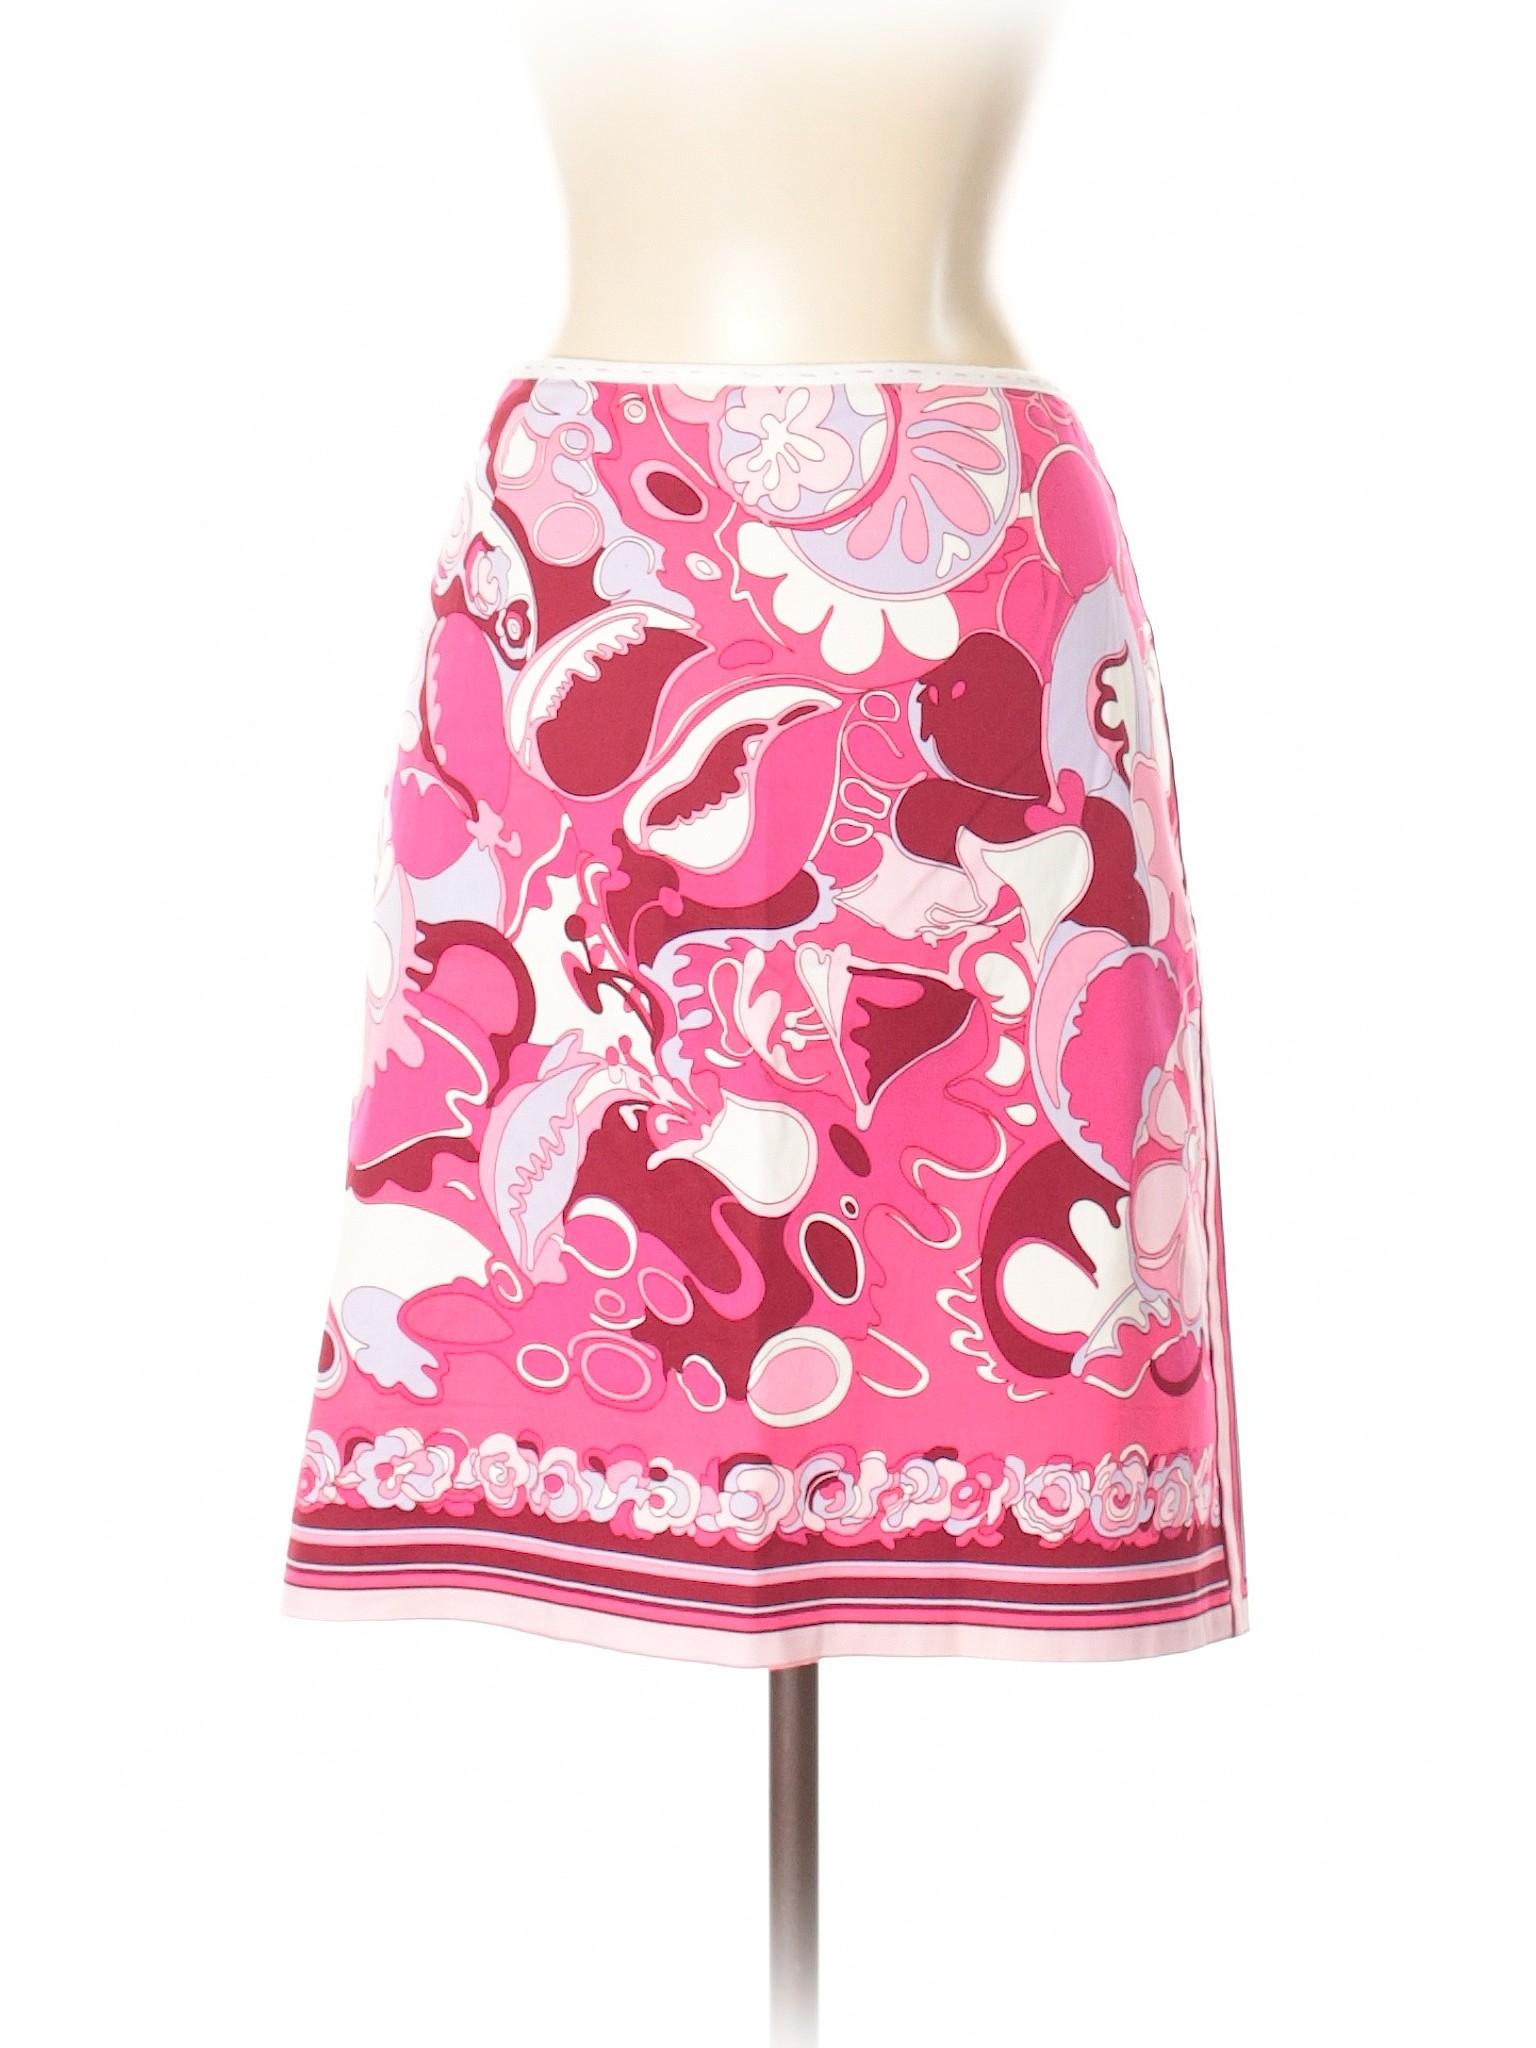 Boutique Boutique Skirt Casual Boutique Boutique Boutique Casual Boutique Casual Skirt Skirt Casual Casual Skirt Skirt wEgqIAF